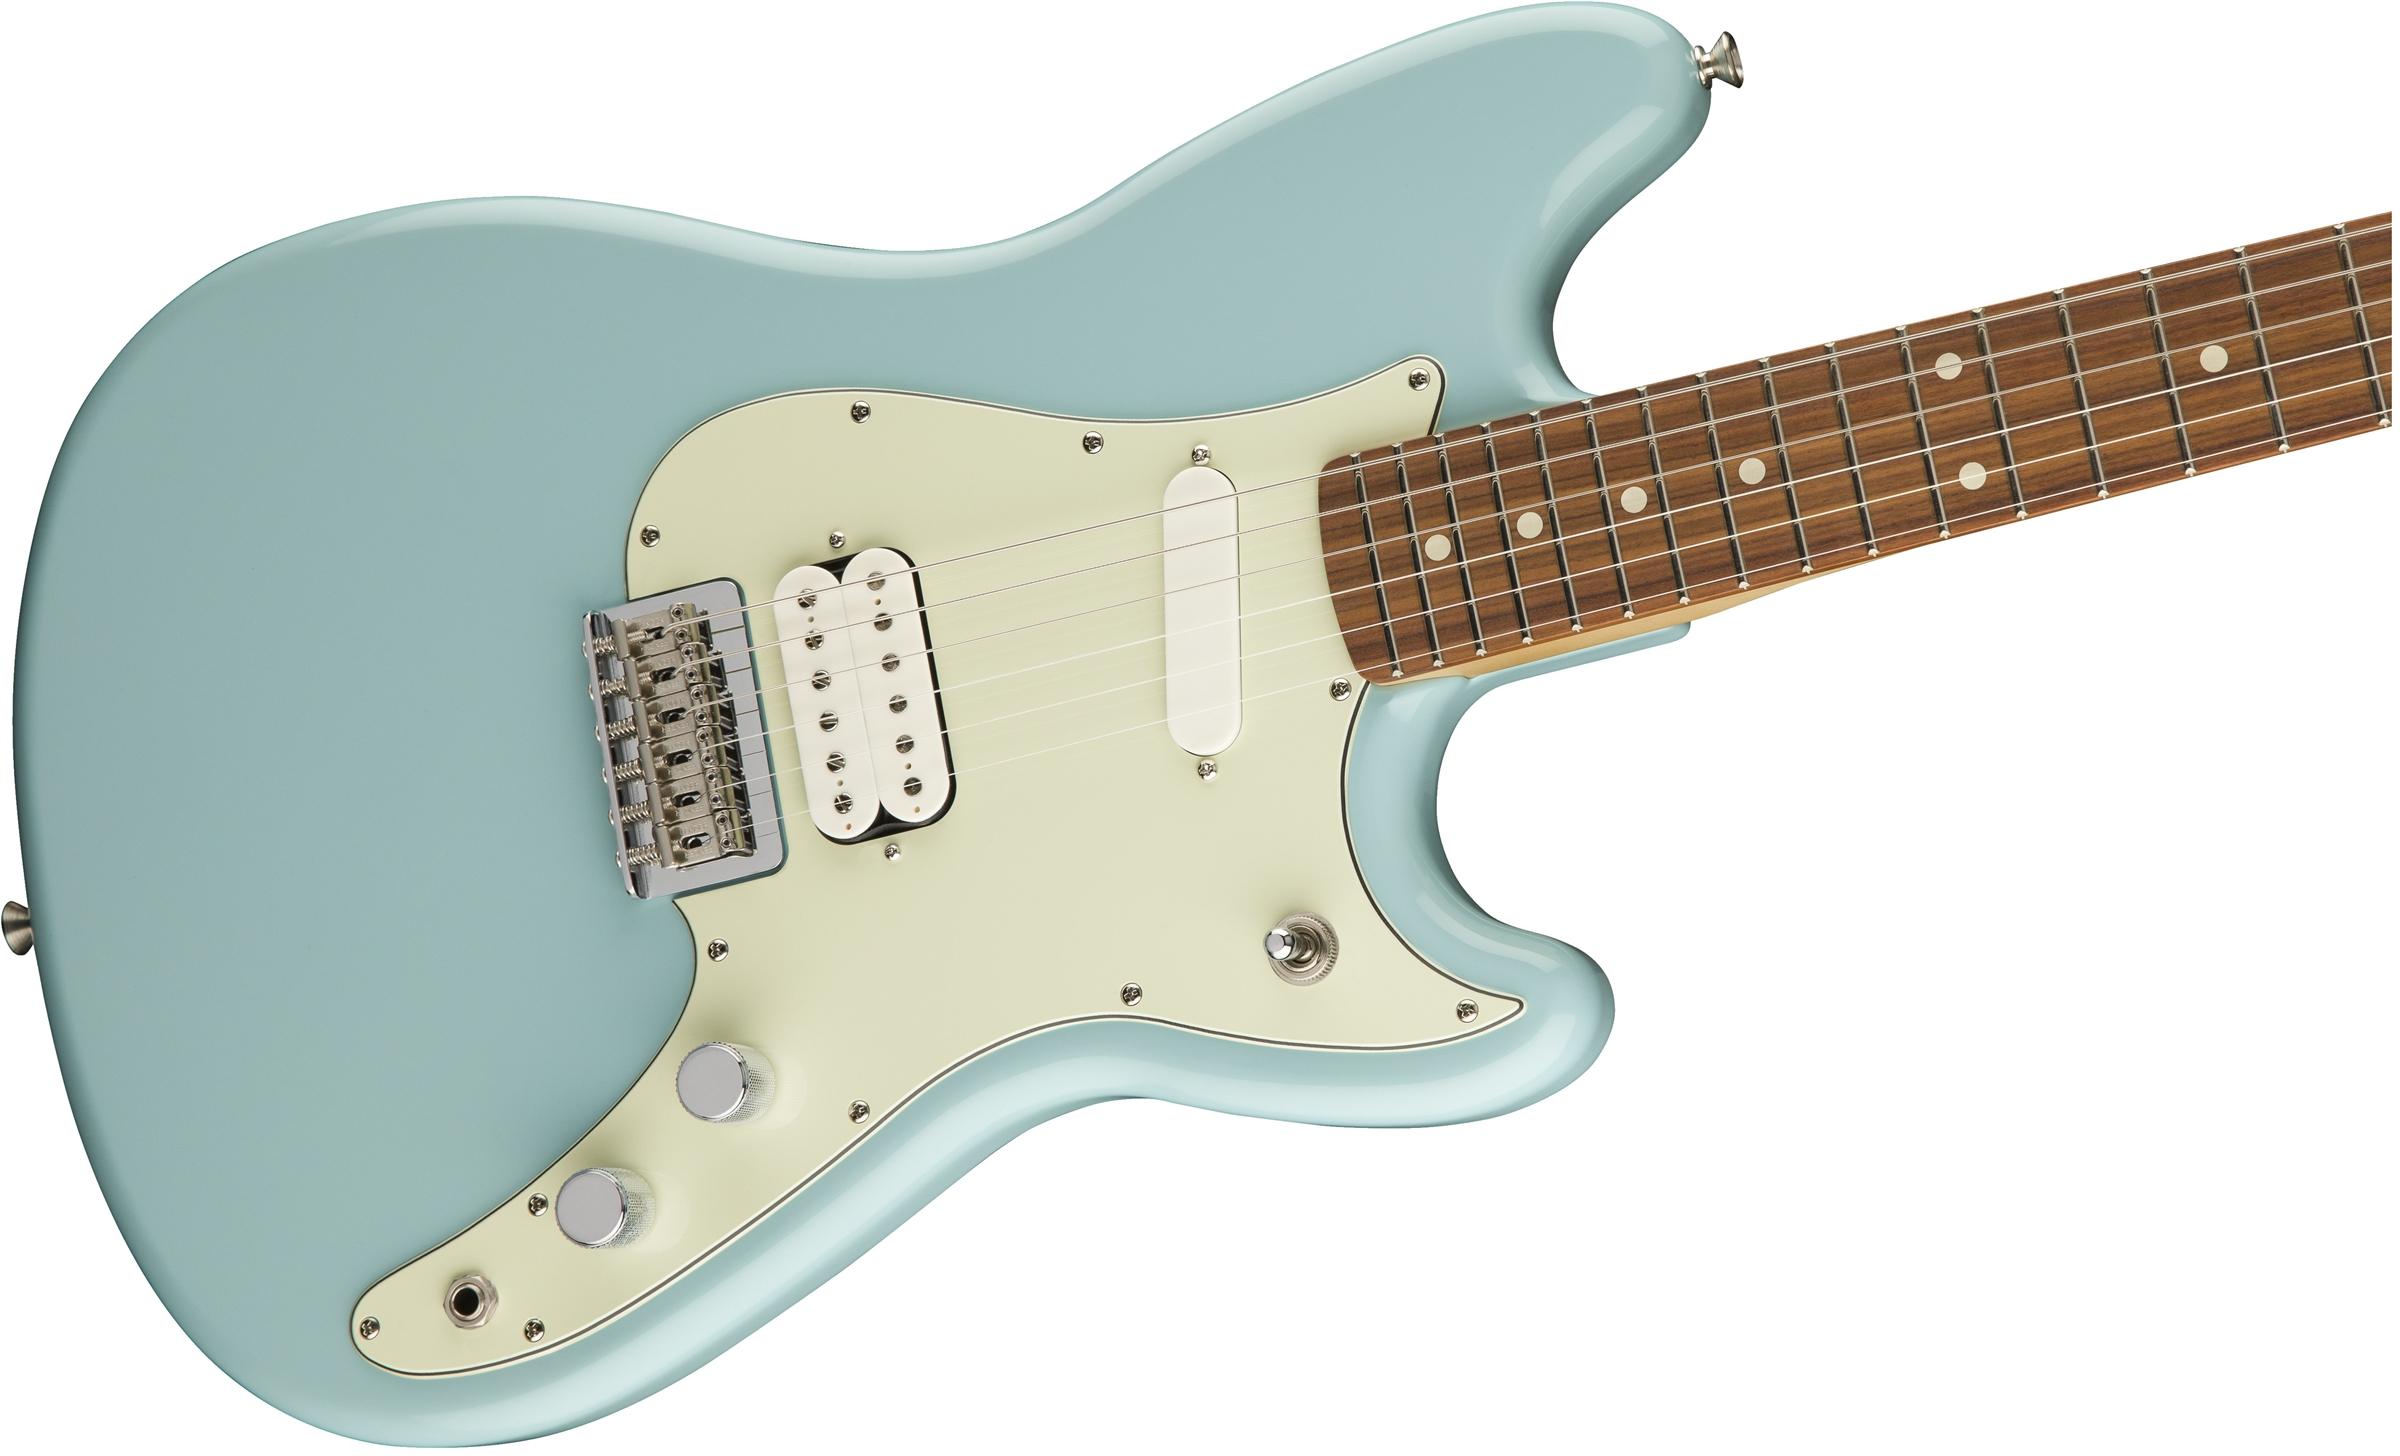 Dee02 Fender Duo Sonic Wiring Diagram